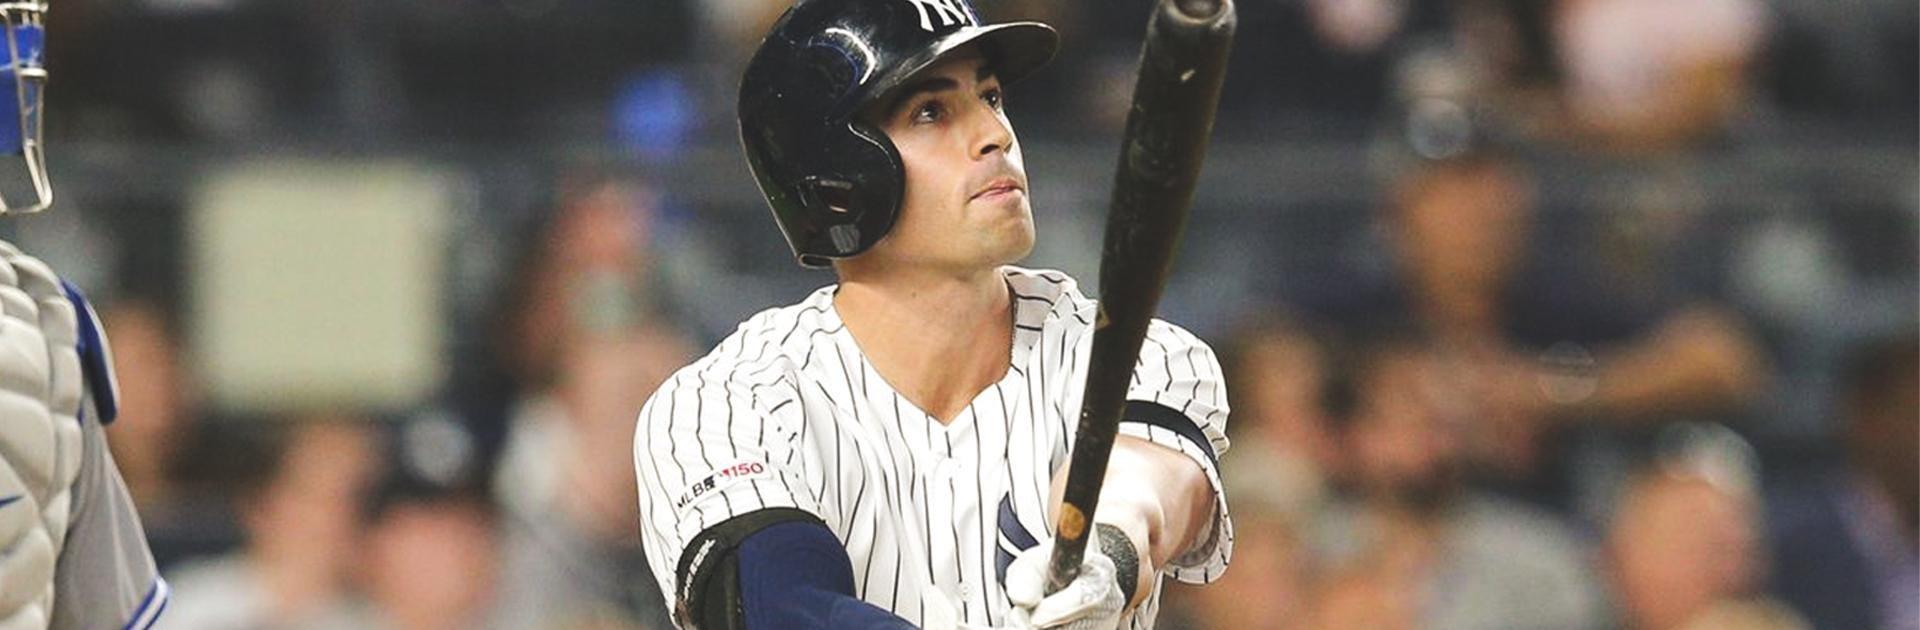 Tyler-Wade-Louisville-Slugger-Baseball-Bat